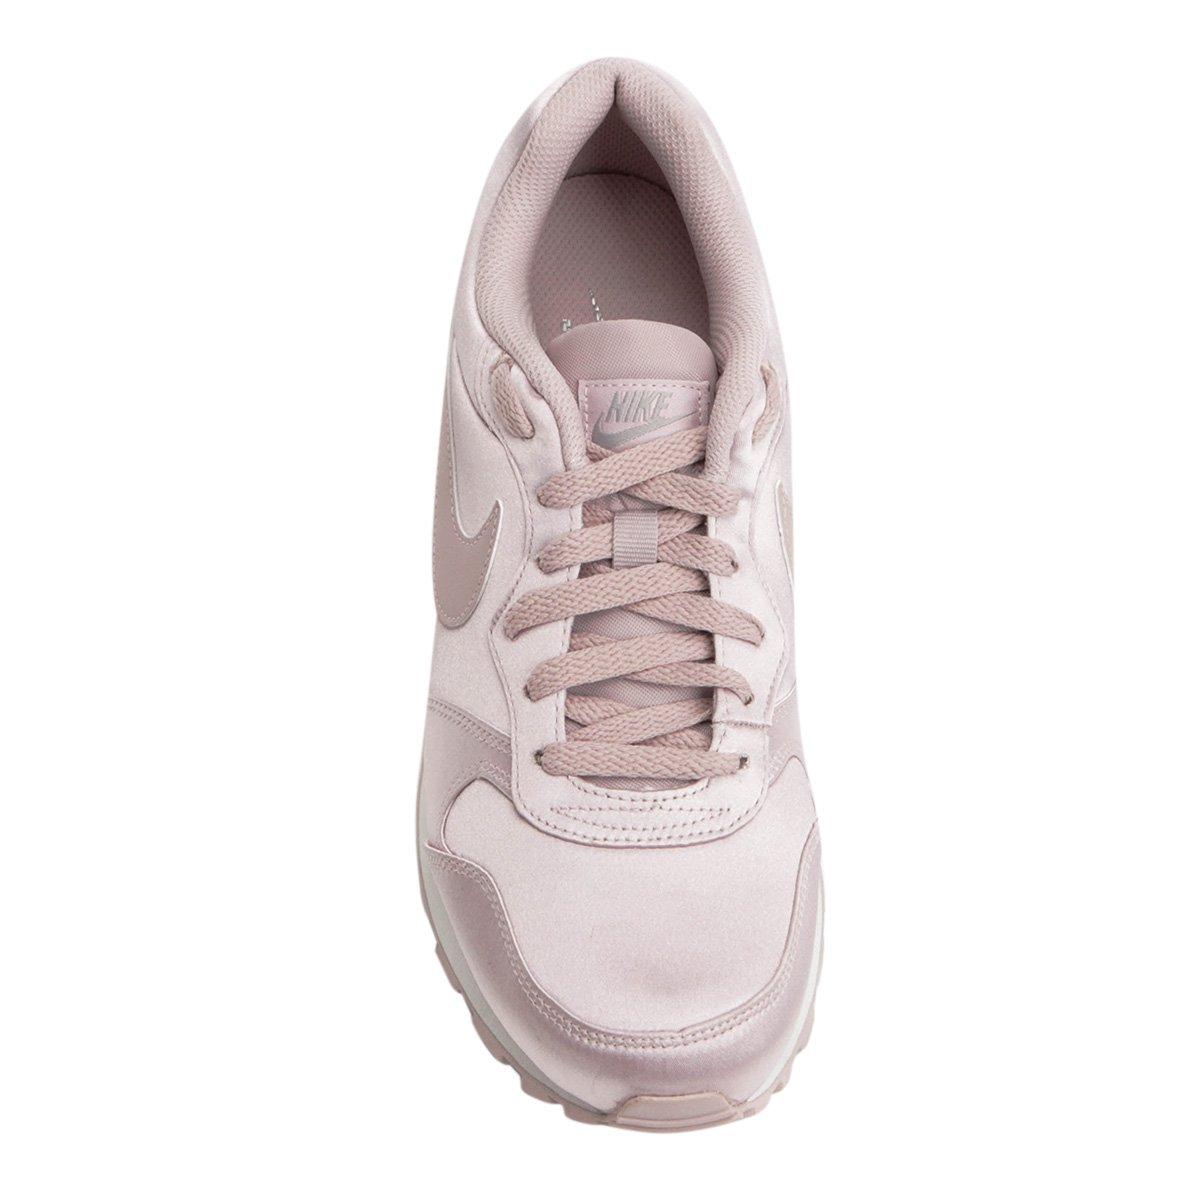 544ad9e5844d3 ... f95346a1b11 Tênis Nike Air Max Advantage Feminino Rosa Claro Thamyres  Em ...